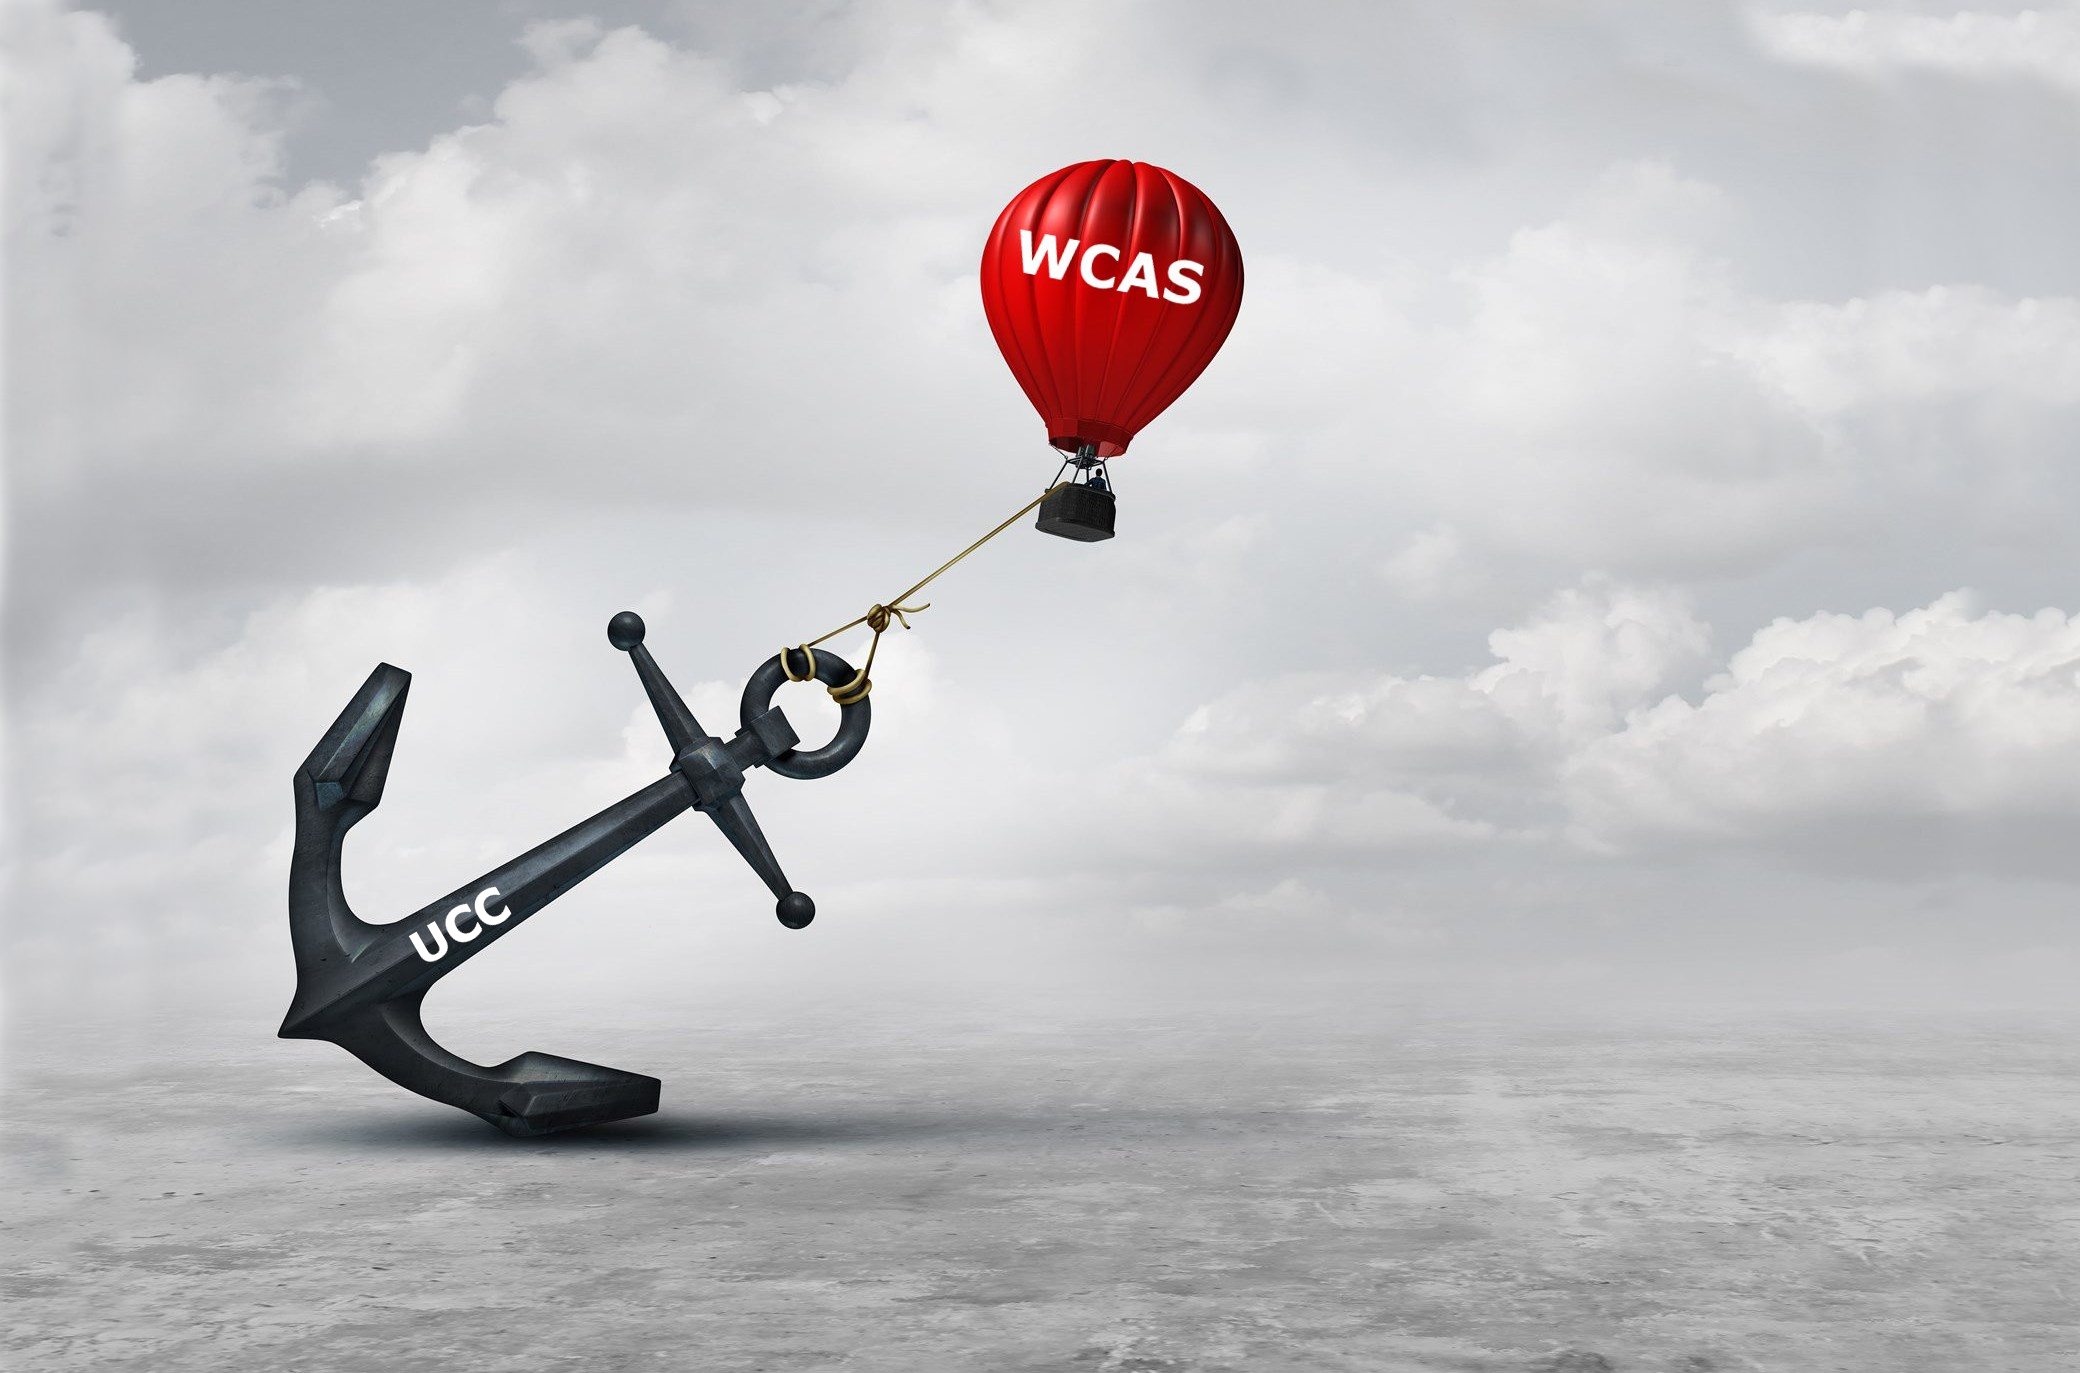 wcas1.png